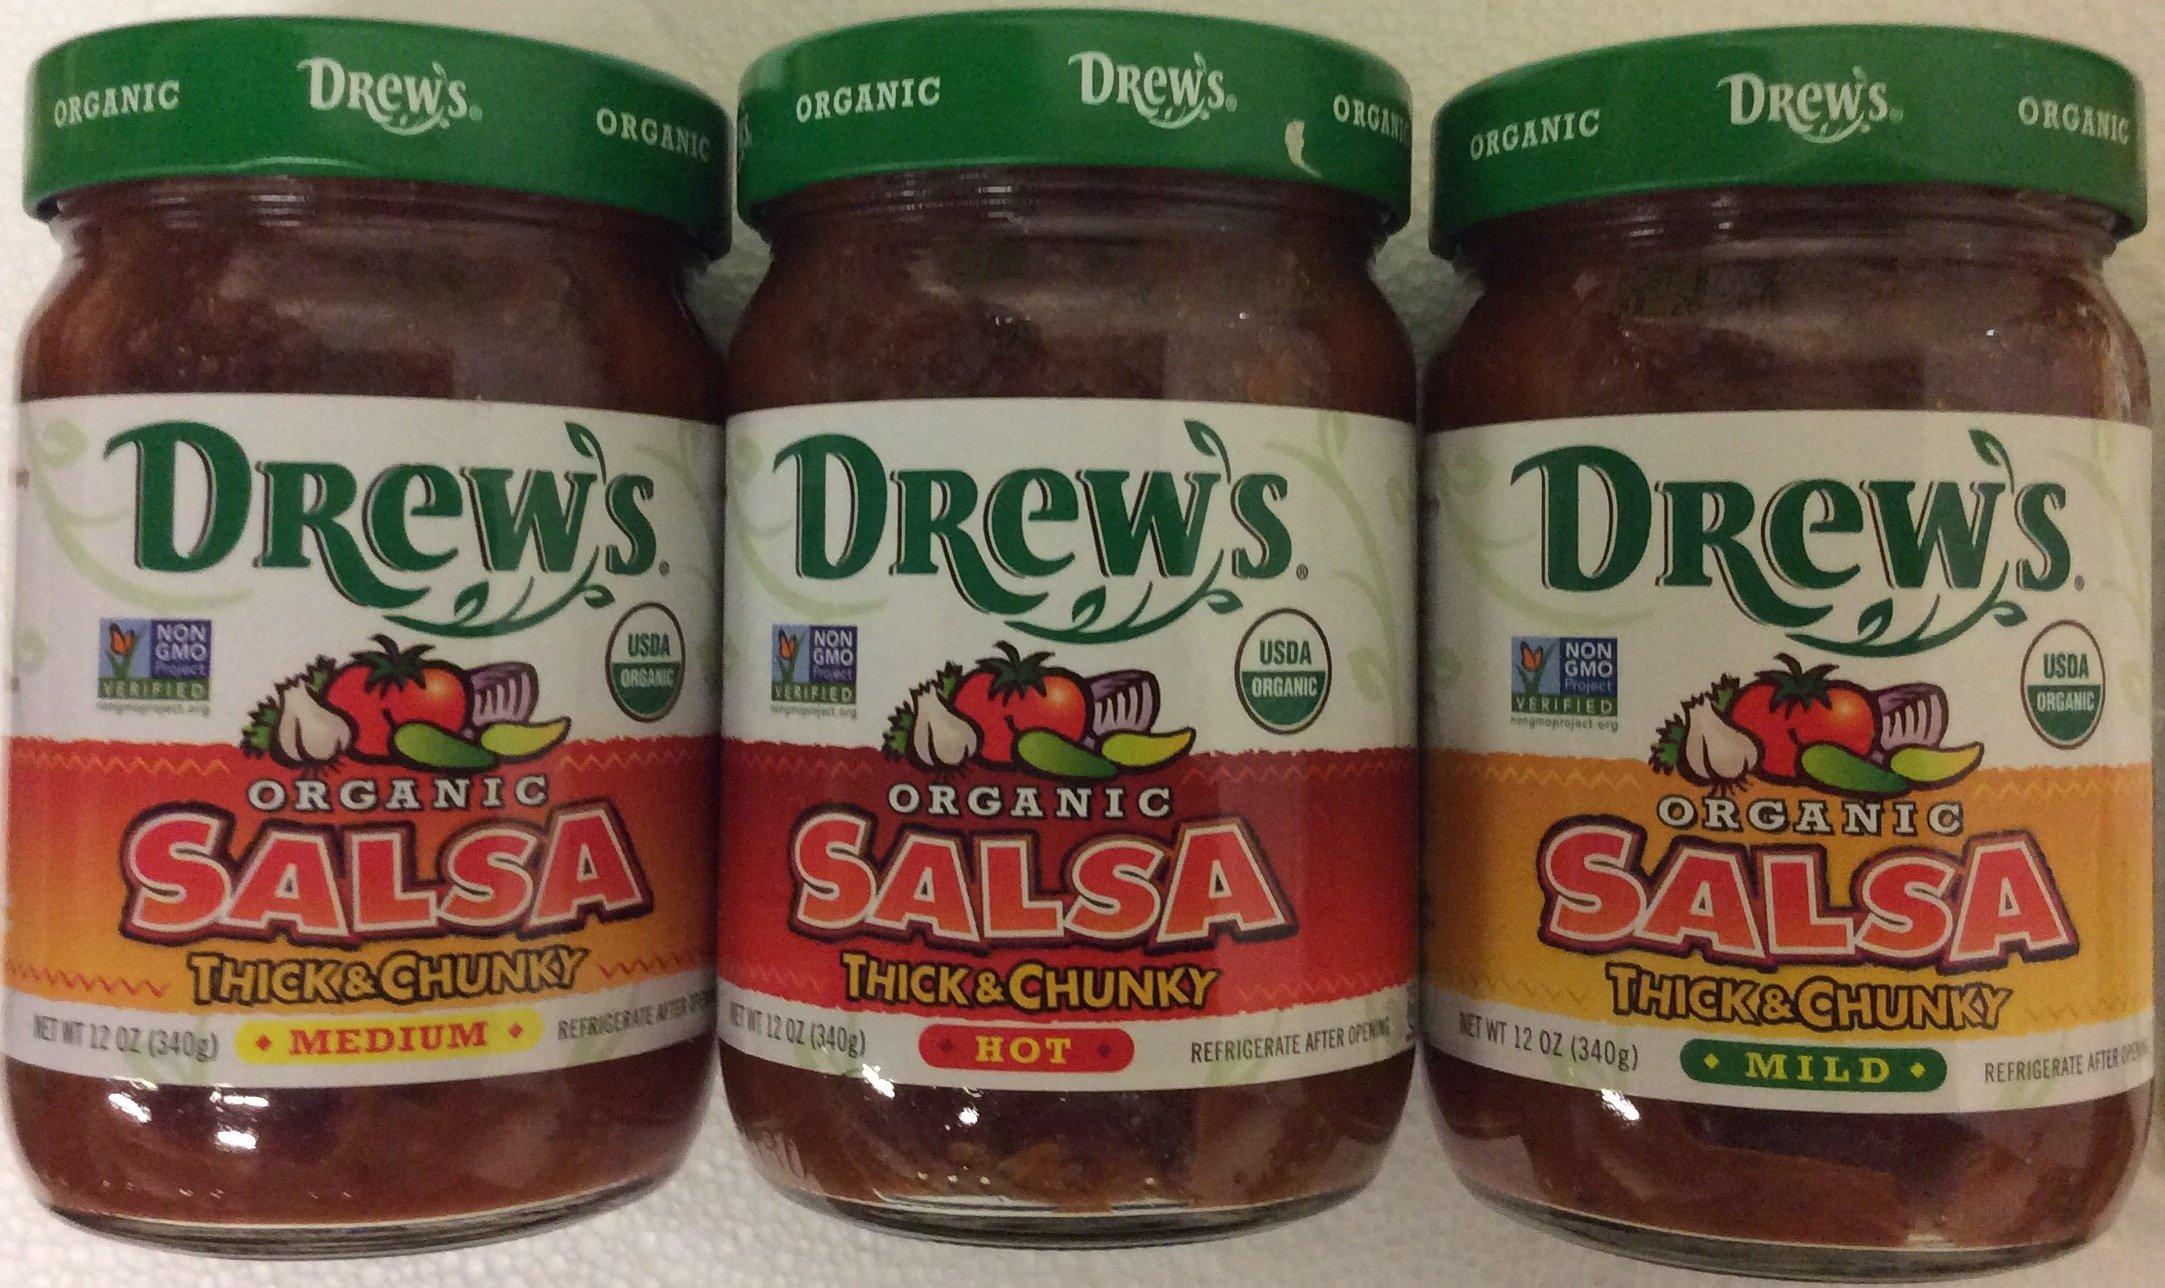 Drew's Organic Thick & Chunky Salsa Variety Pack- Hot, Medium & Mild 12 oz (pack of 3) by Drews All Natur